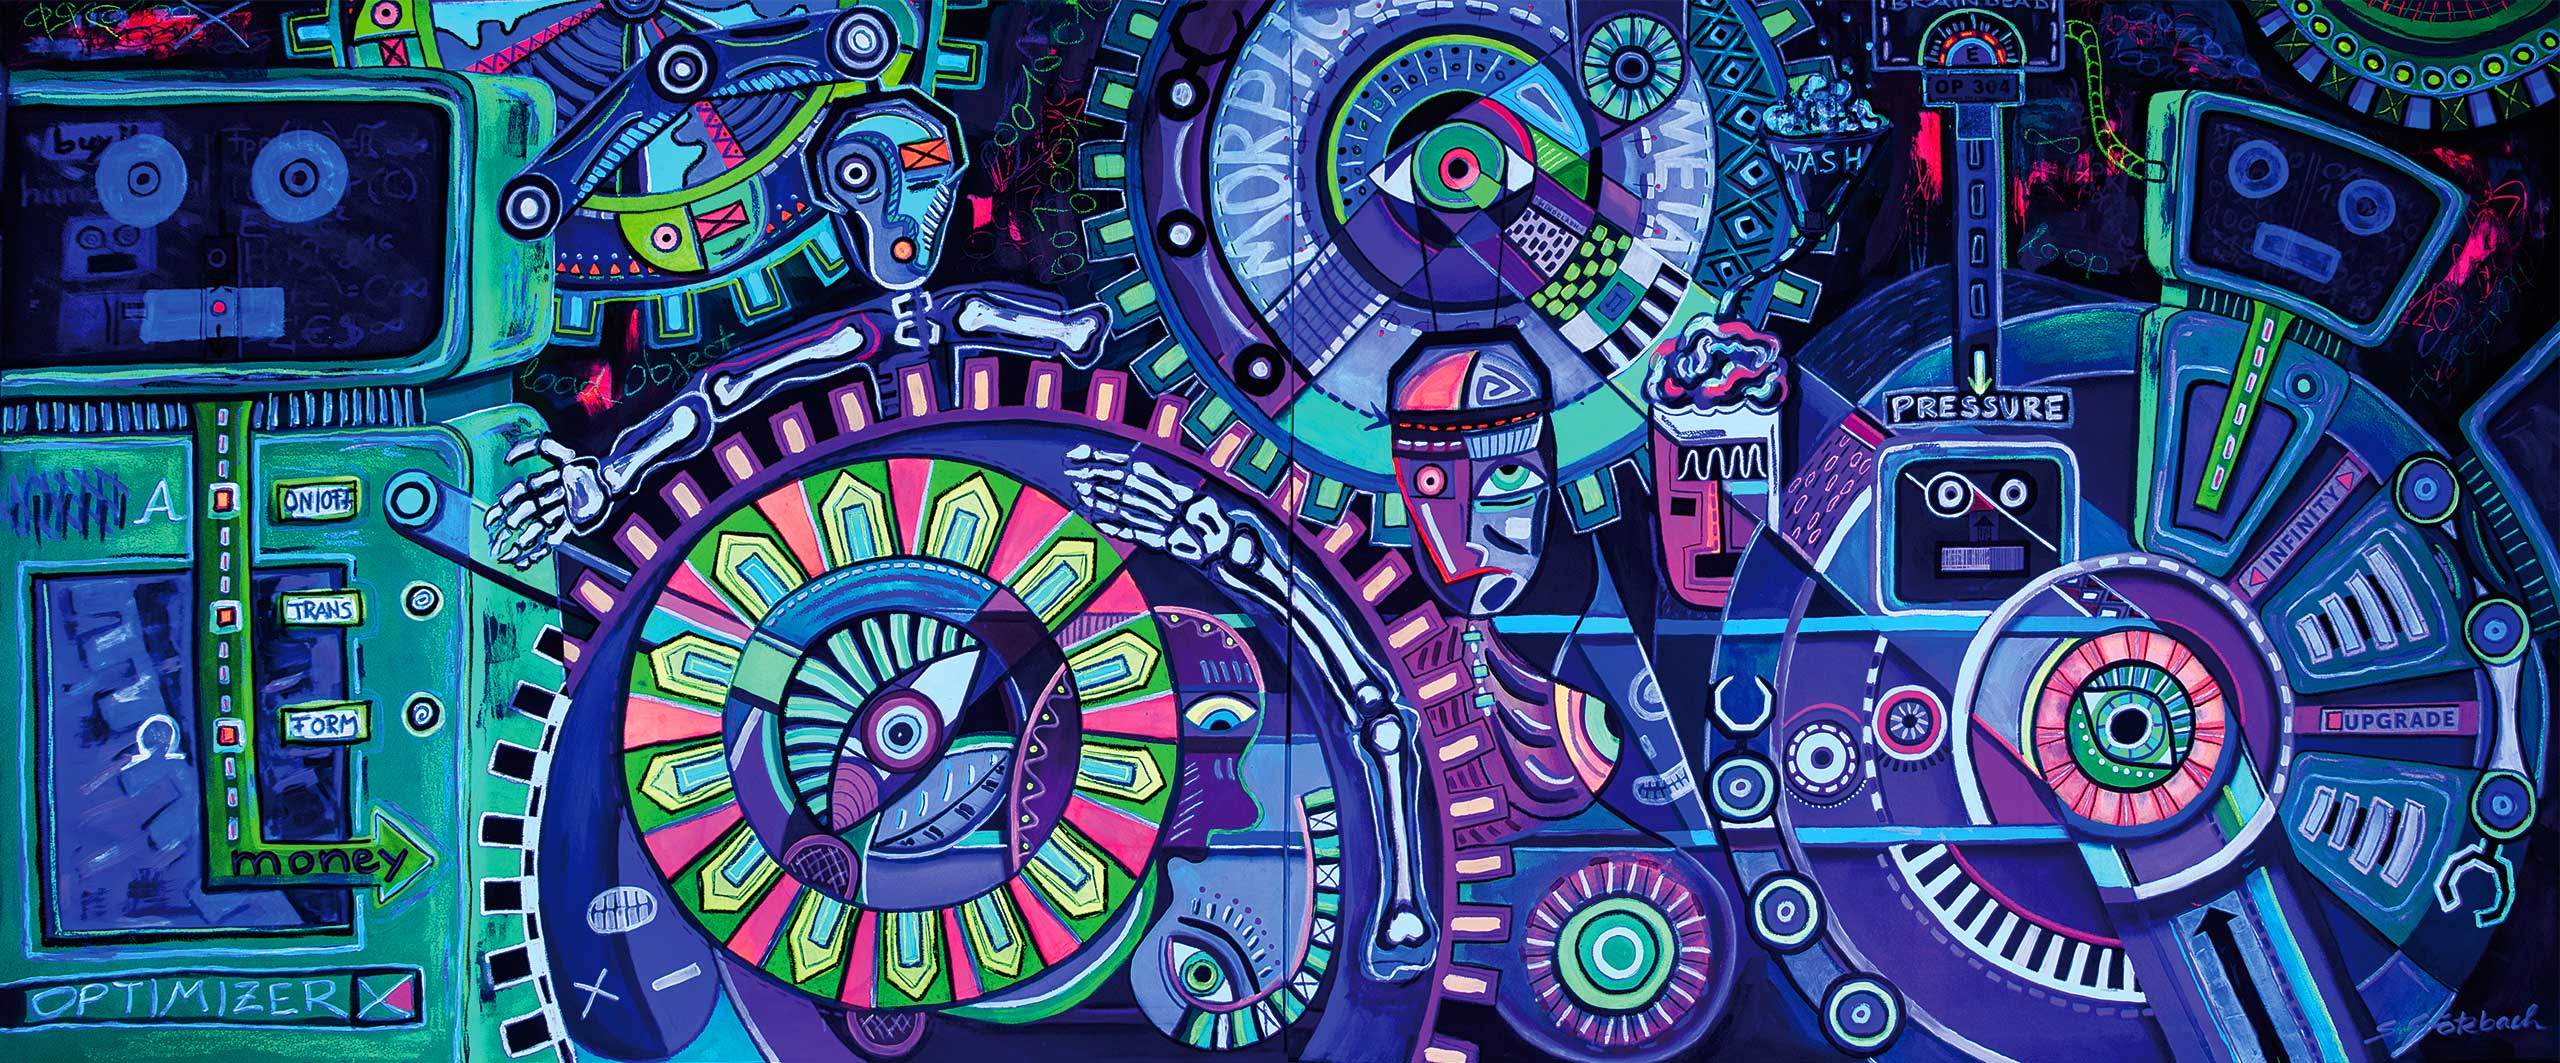 Grötzbach, sabine grötzbach, groetzbach, sgroetzbach, UV, Blacklight, Blacklight-art, Blacklightart, ultraviolett, ultra violett, ultra-violett, uv-kunst, moderne kunst, modern art, expressionismus, 76356 Weingarten, 76356, Karlsruhe, Kunst, Kunst Karlsruhe, Ausstellung, Art, System